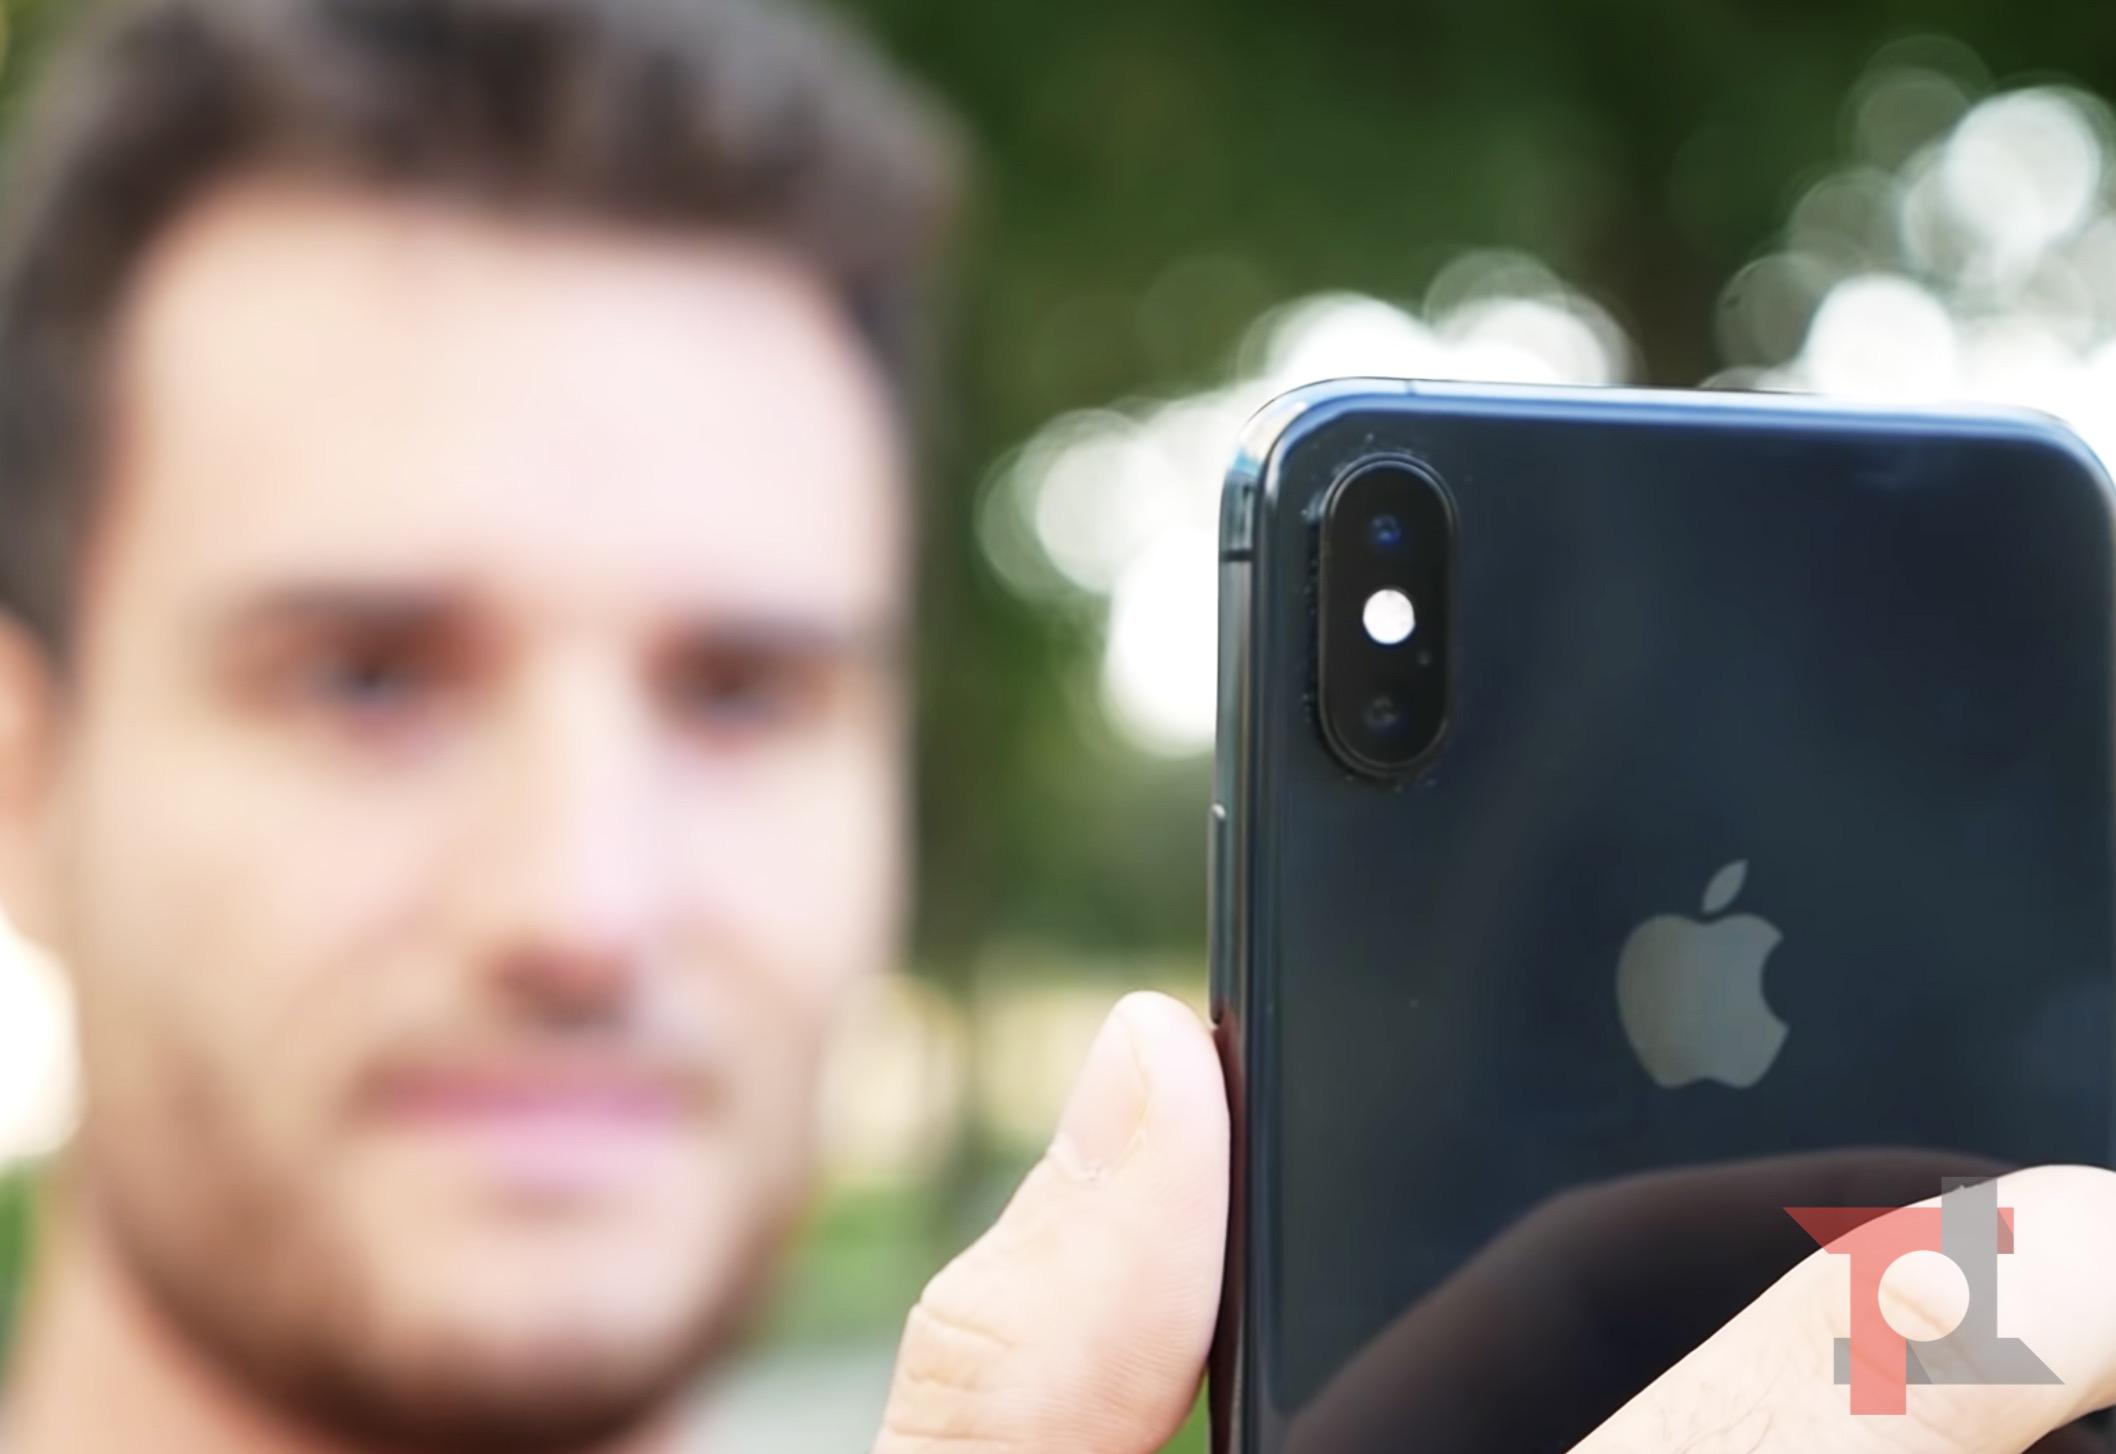 I prezzi per l'Italia di iPhone 11 e iPhone 11 Pro